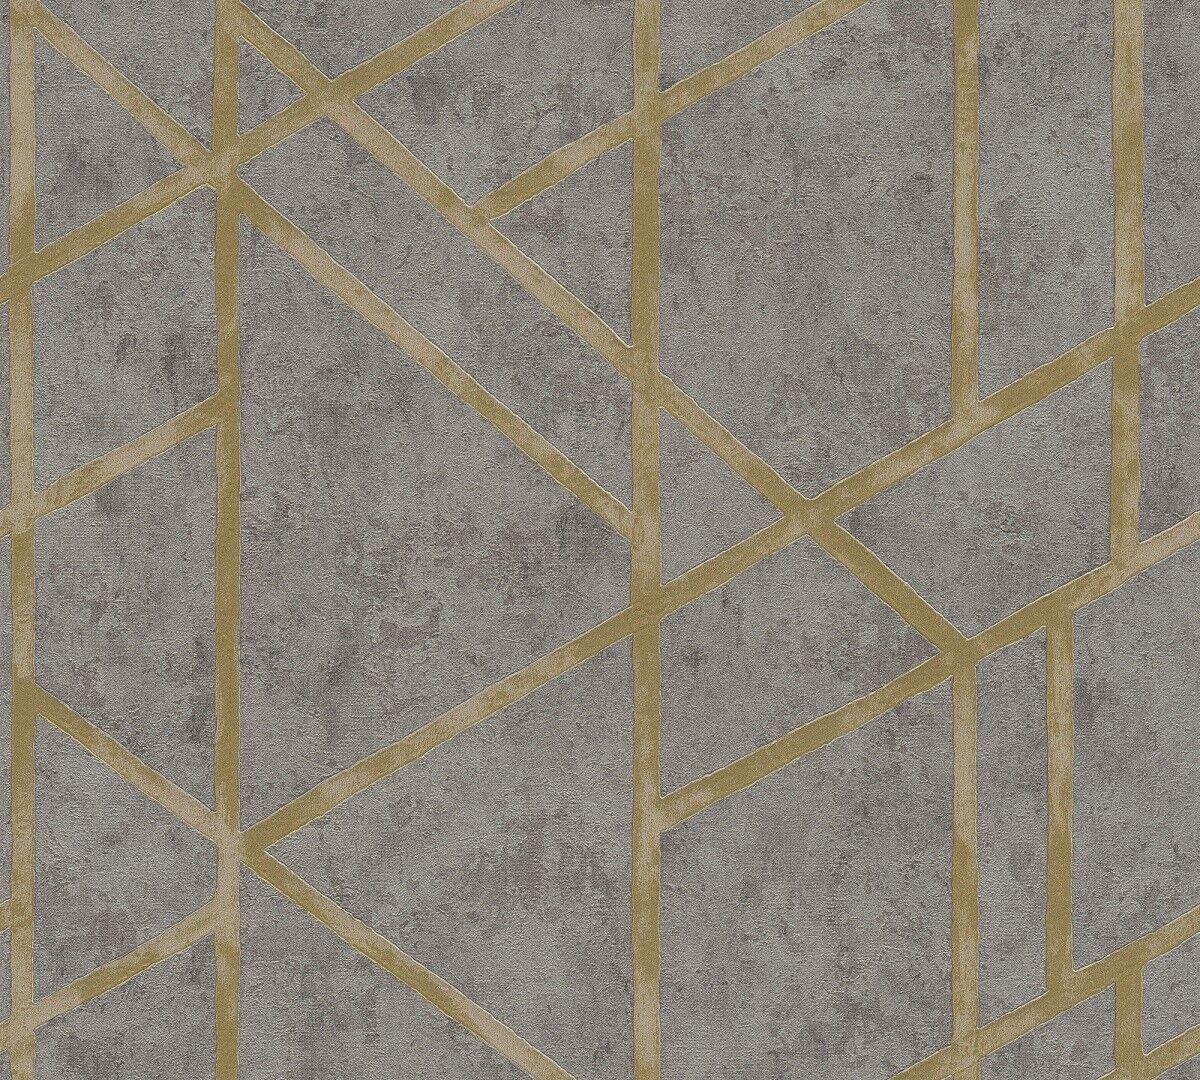 Fabulous moderne Geometrische Stein Beton Muster Vliestapete grau gold AO25